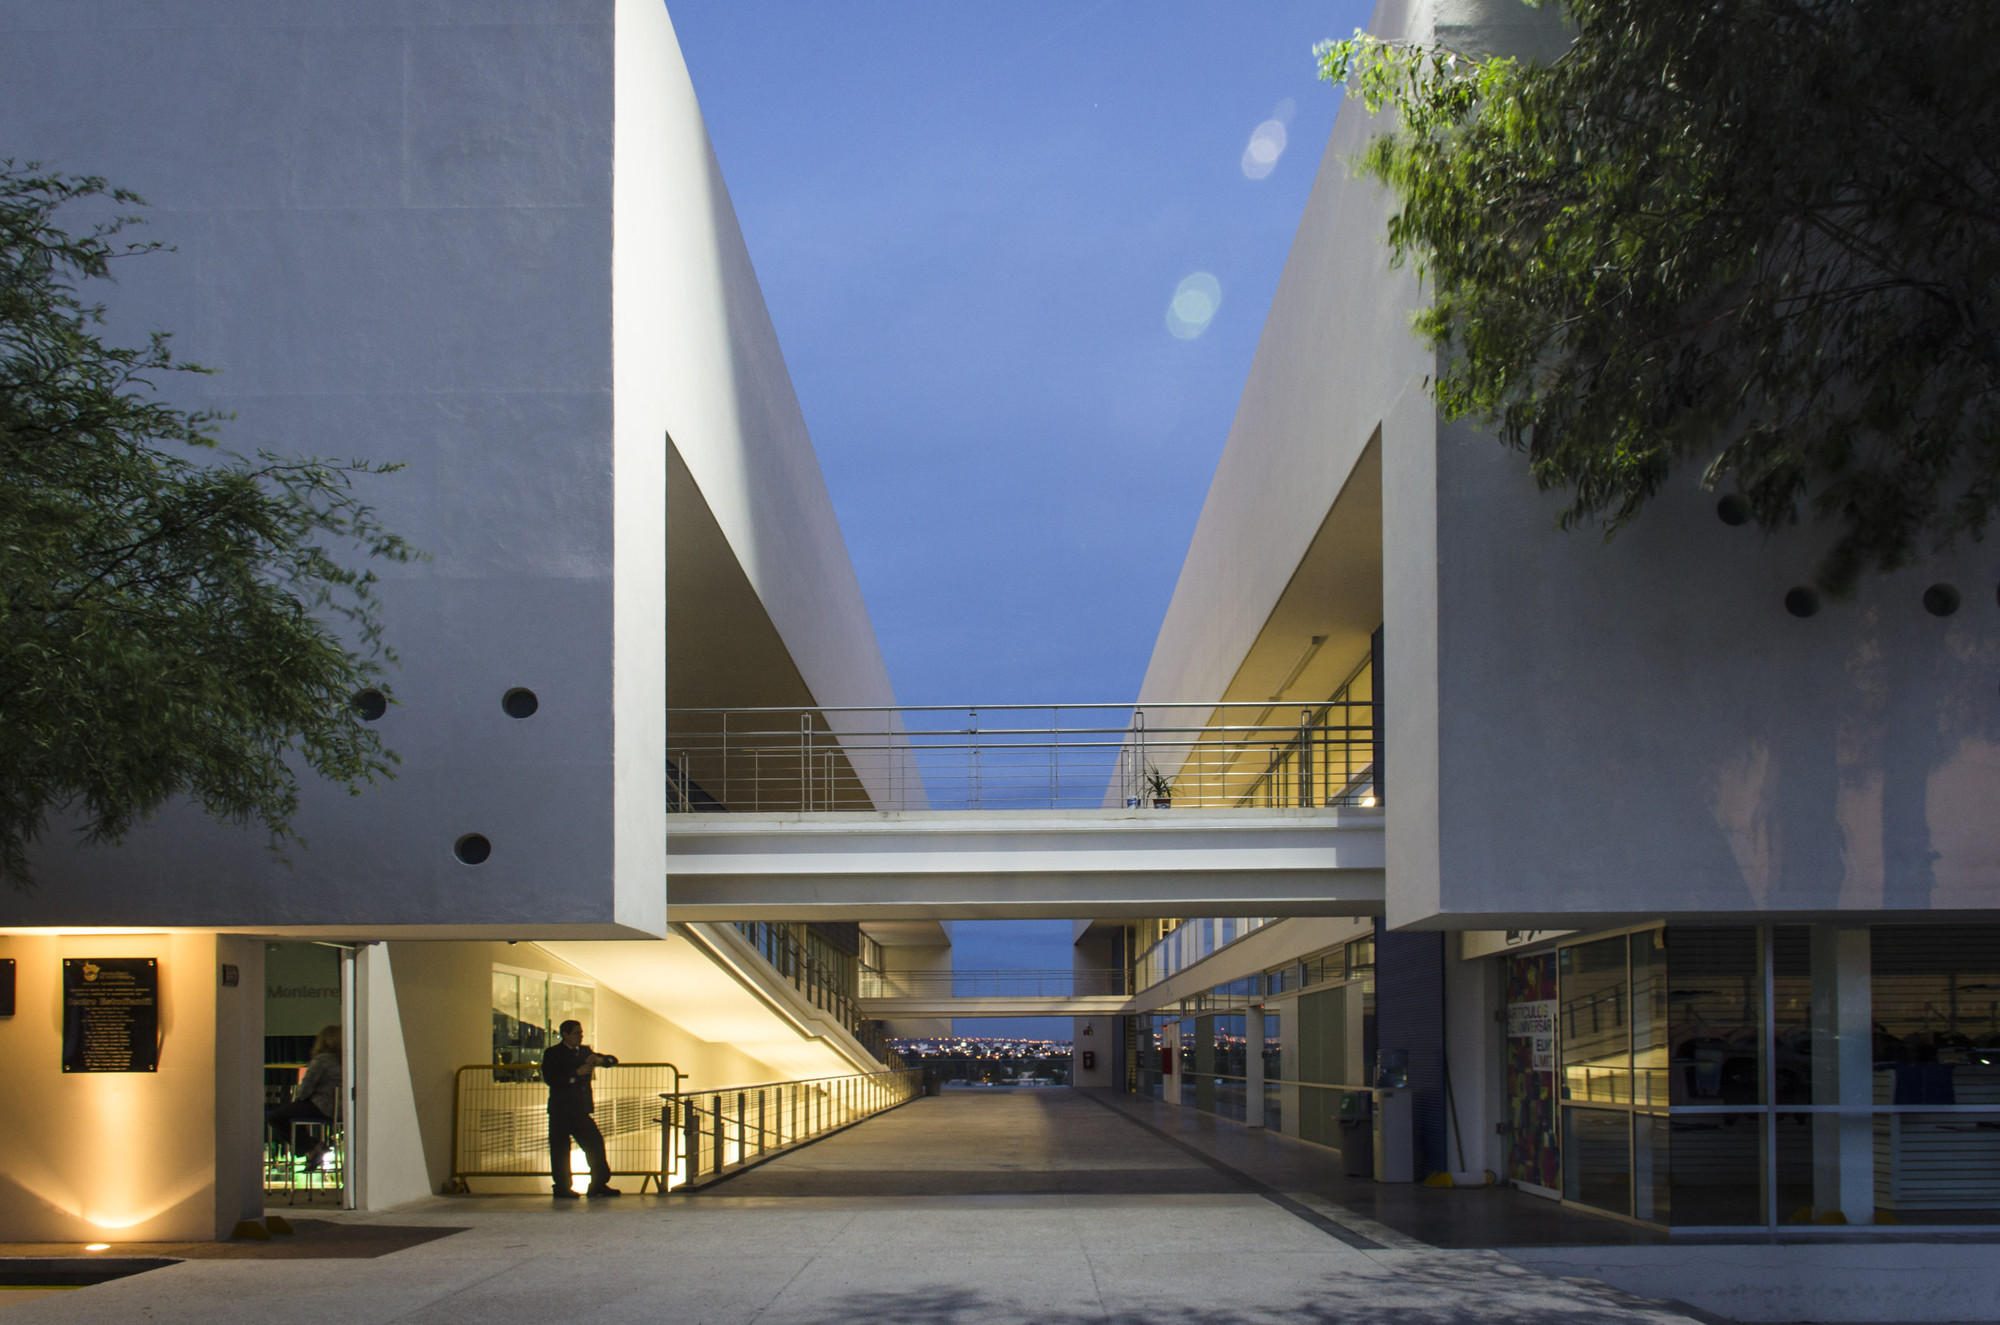 Dae Student Building / Arkylab + Mauricio Ruiz, © Oscar Hernández